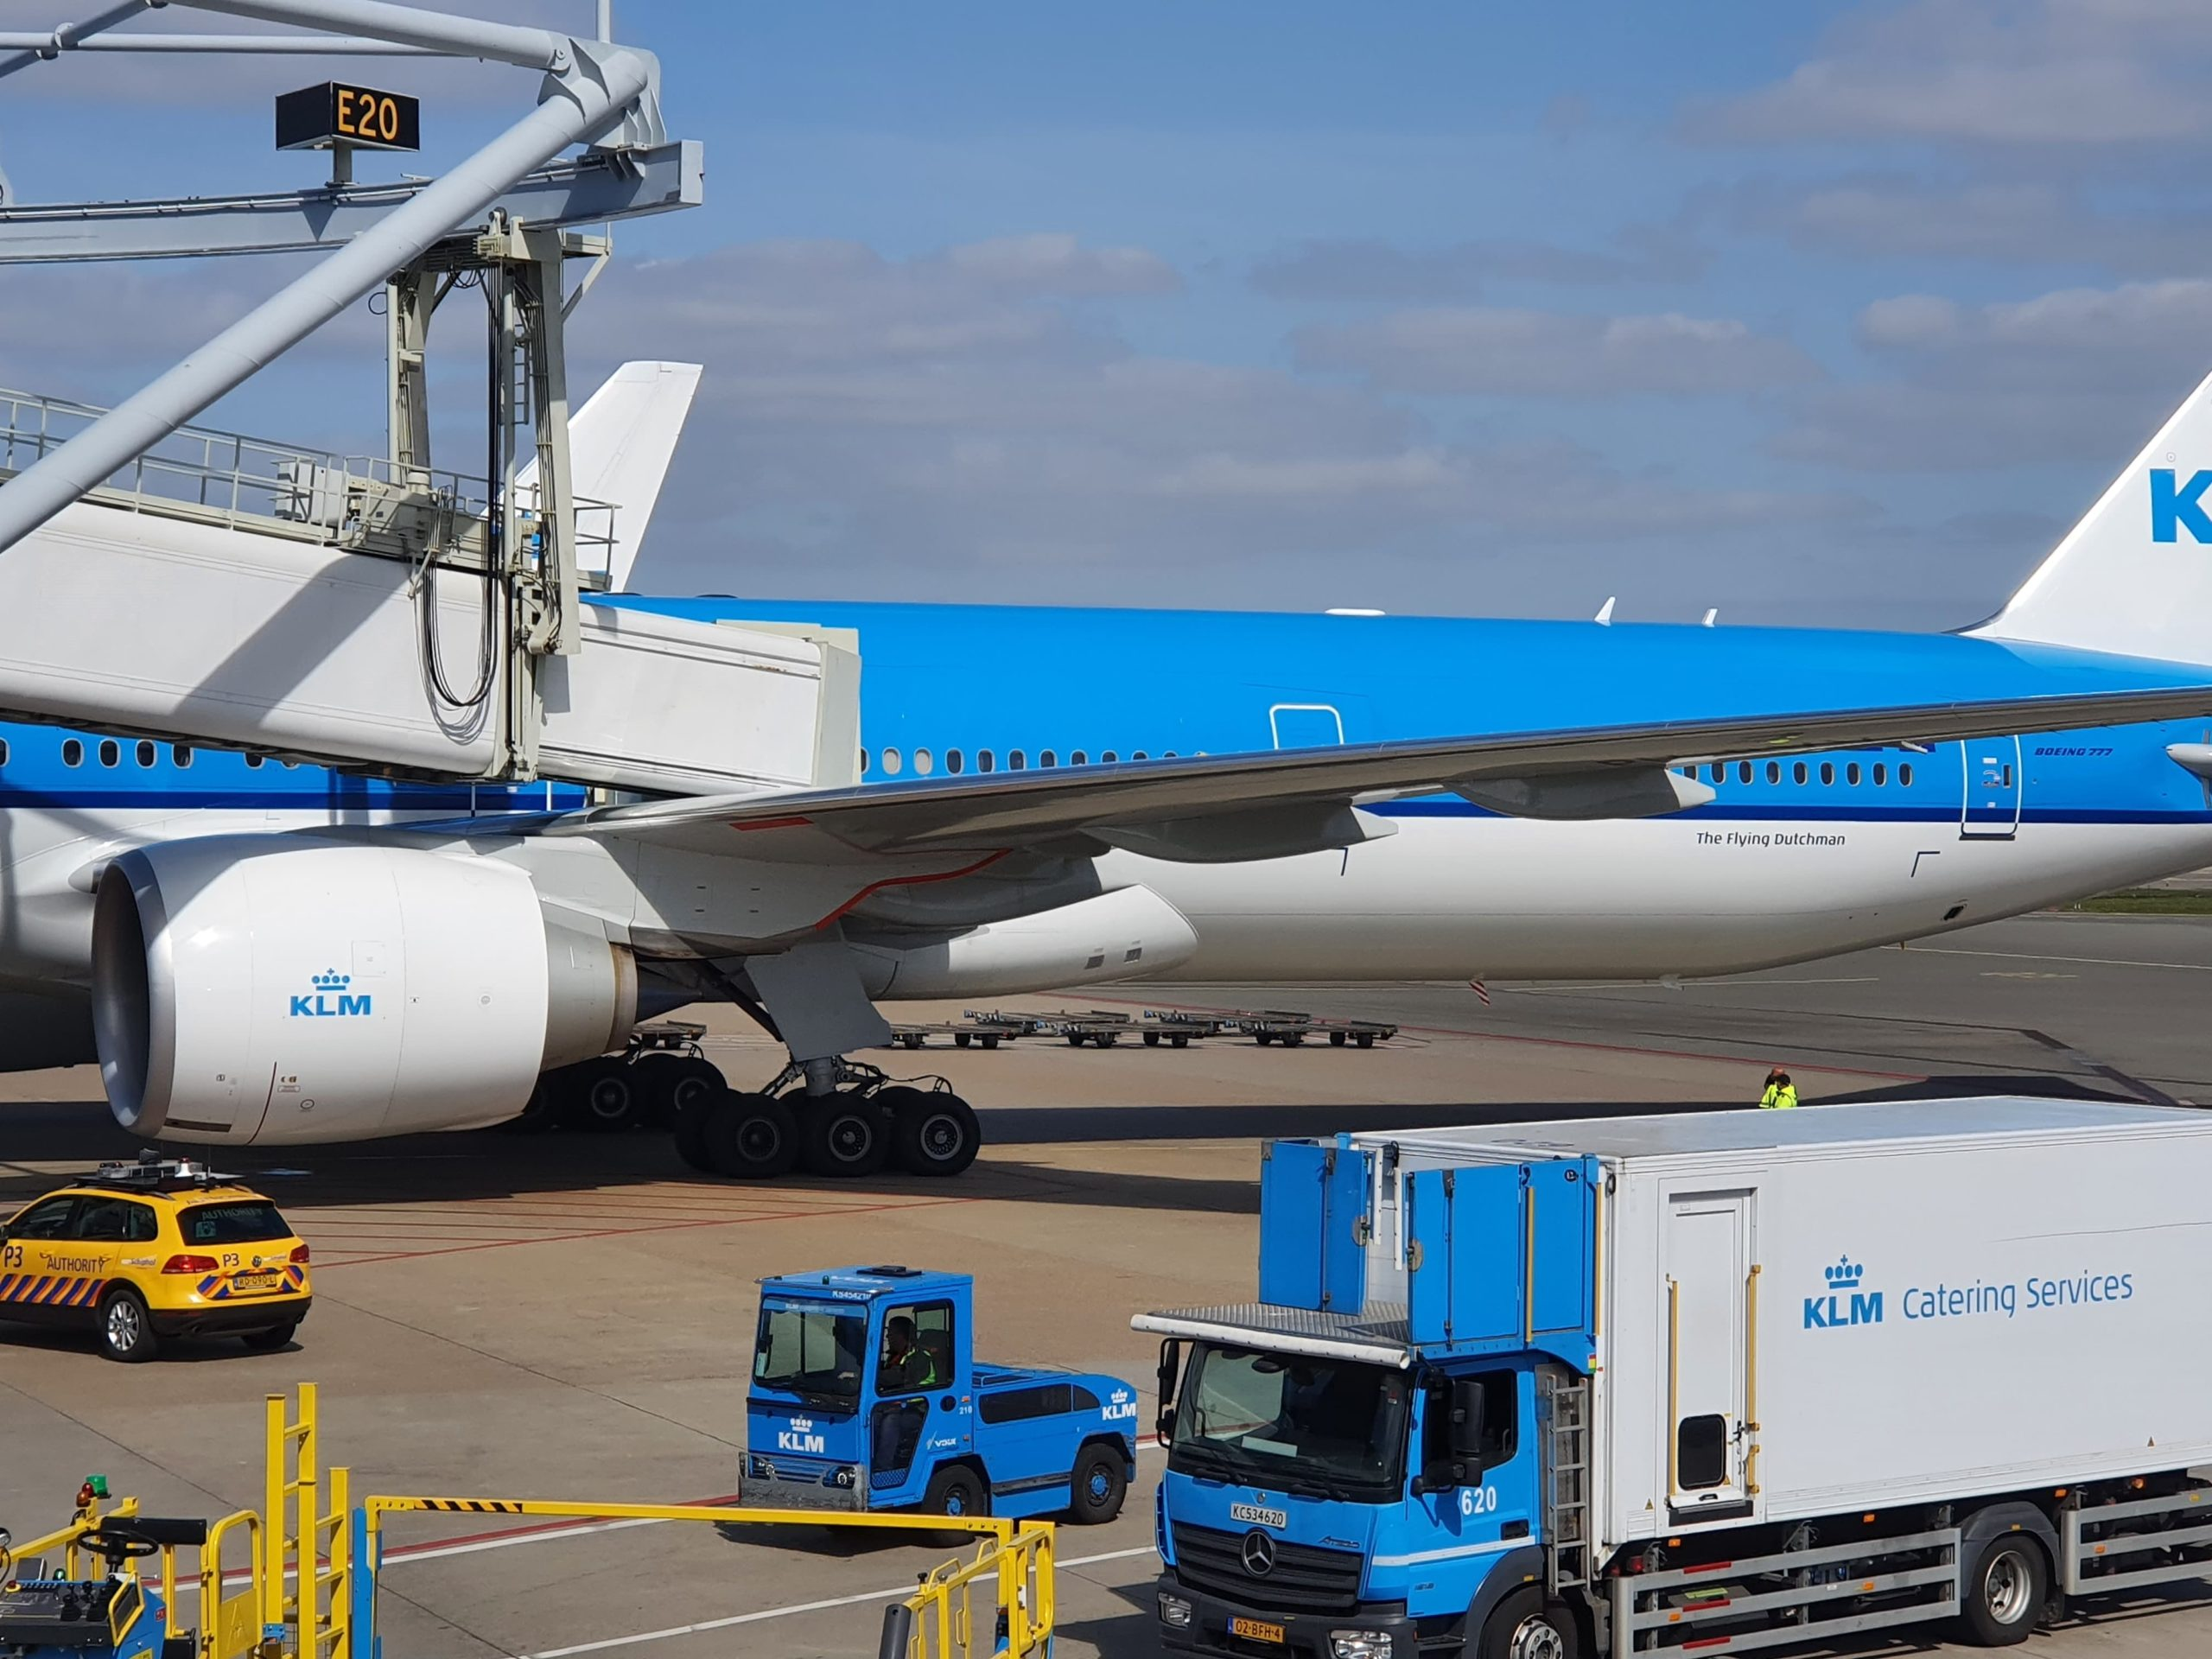 Incident: Brand new KLM Boeing 777-300ER has been damaged during pushback